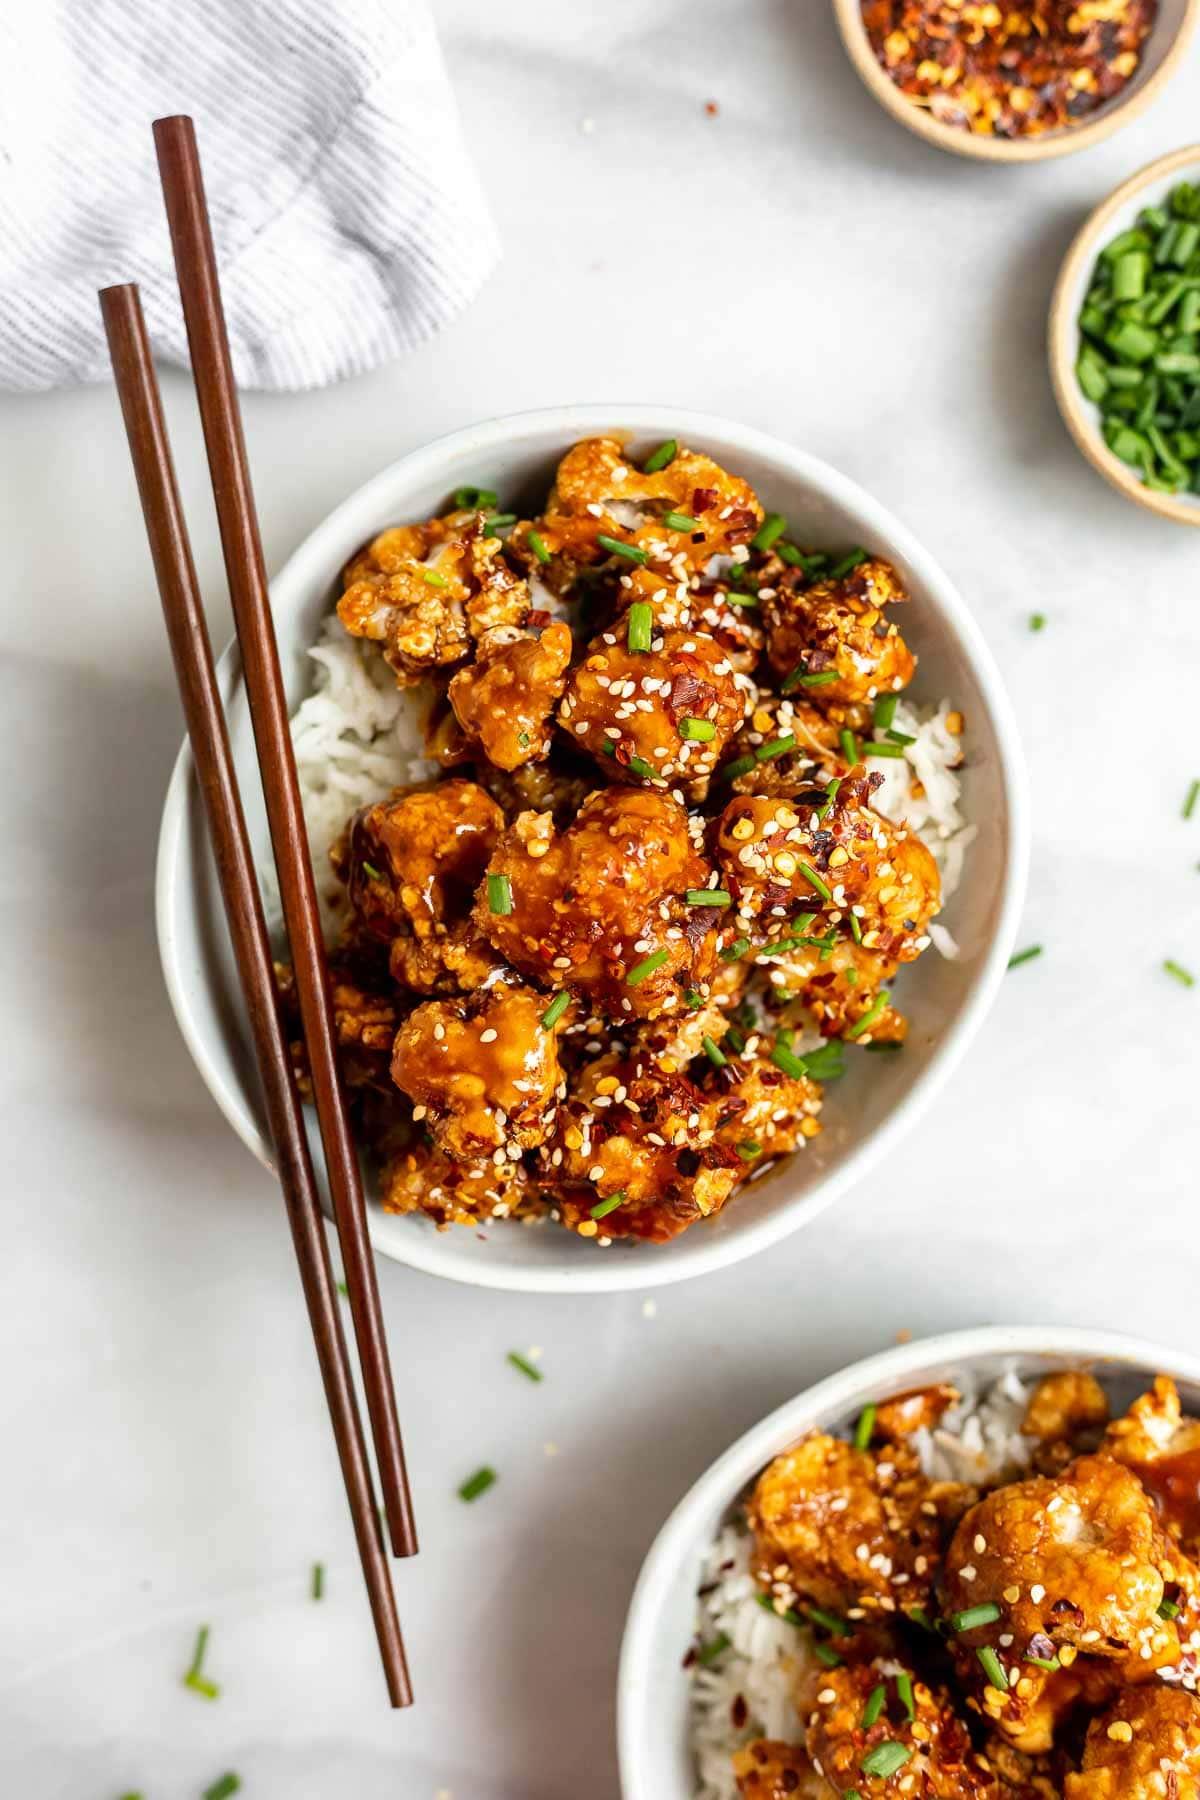 Vegan crispy sesame cauliflower in a bowl with rice and chopsticks.